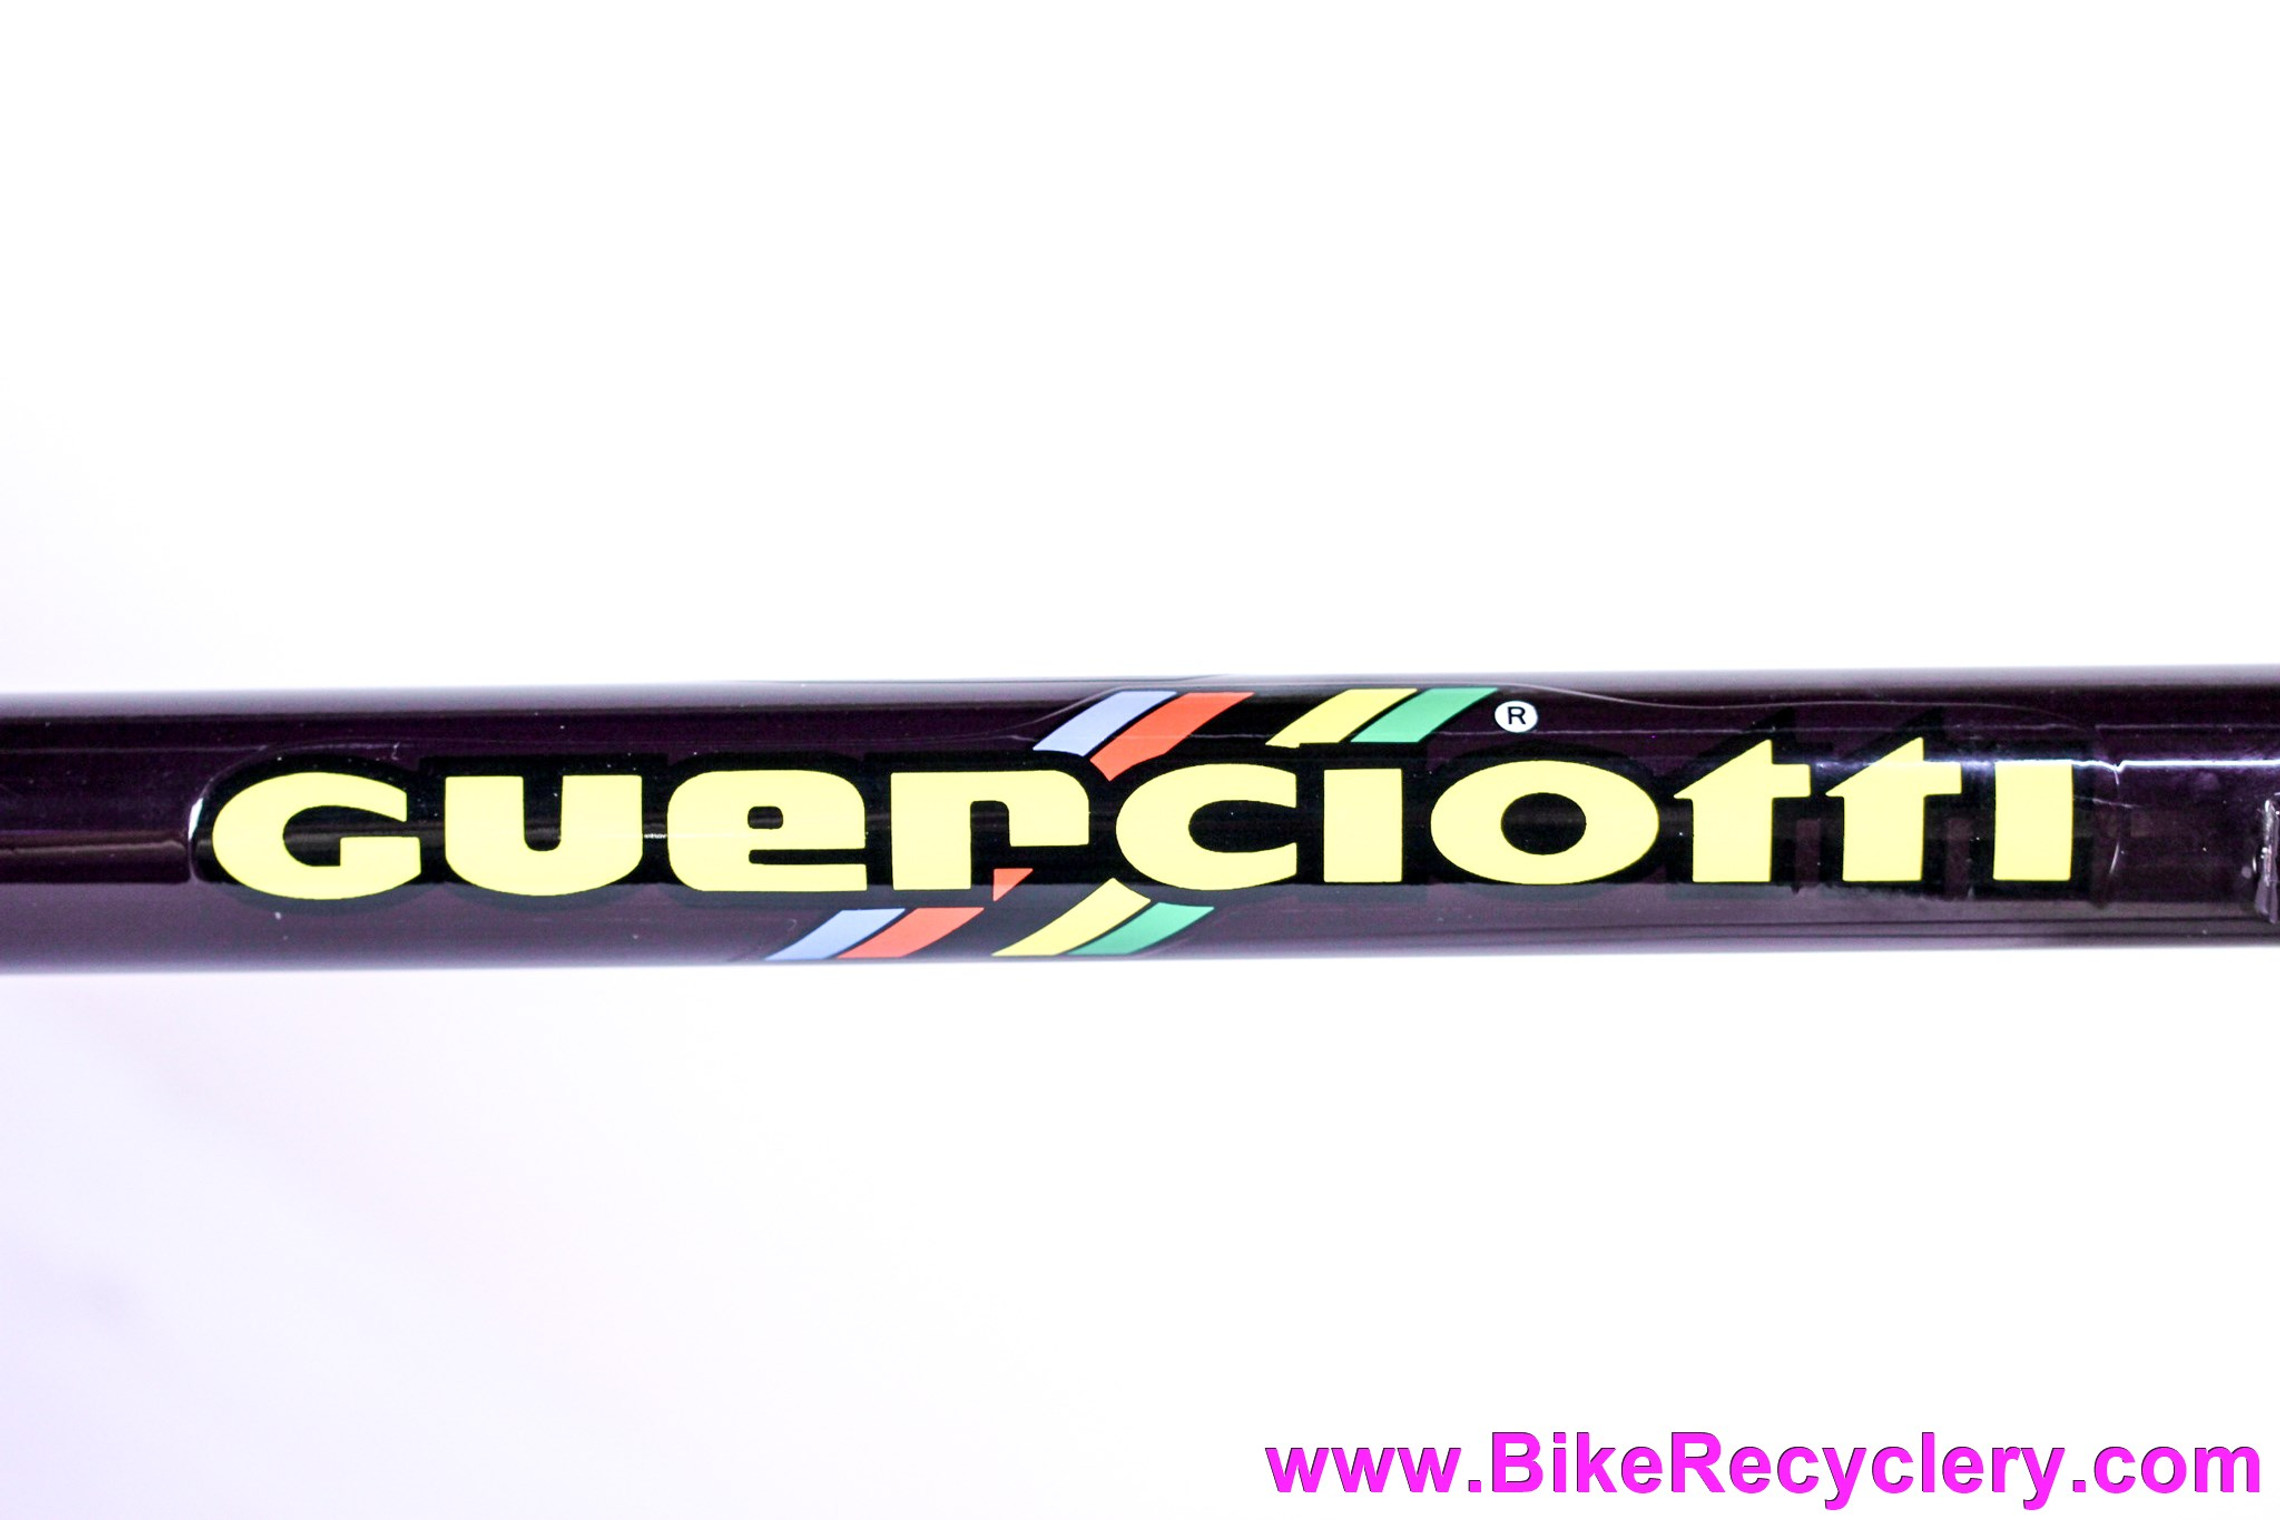 Guerciotti GLX Columbus SL Lugged Steel Frame & Fork: 54cm - Pantographed - DEEP Purple / Black / Pewter Chameleon - 1980's